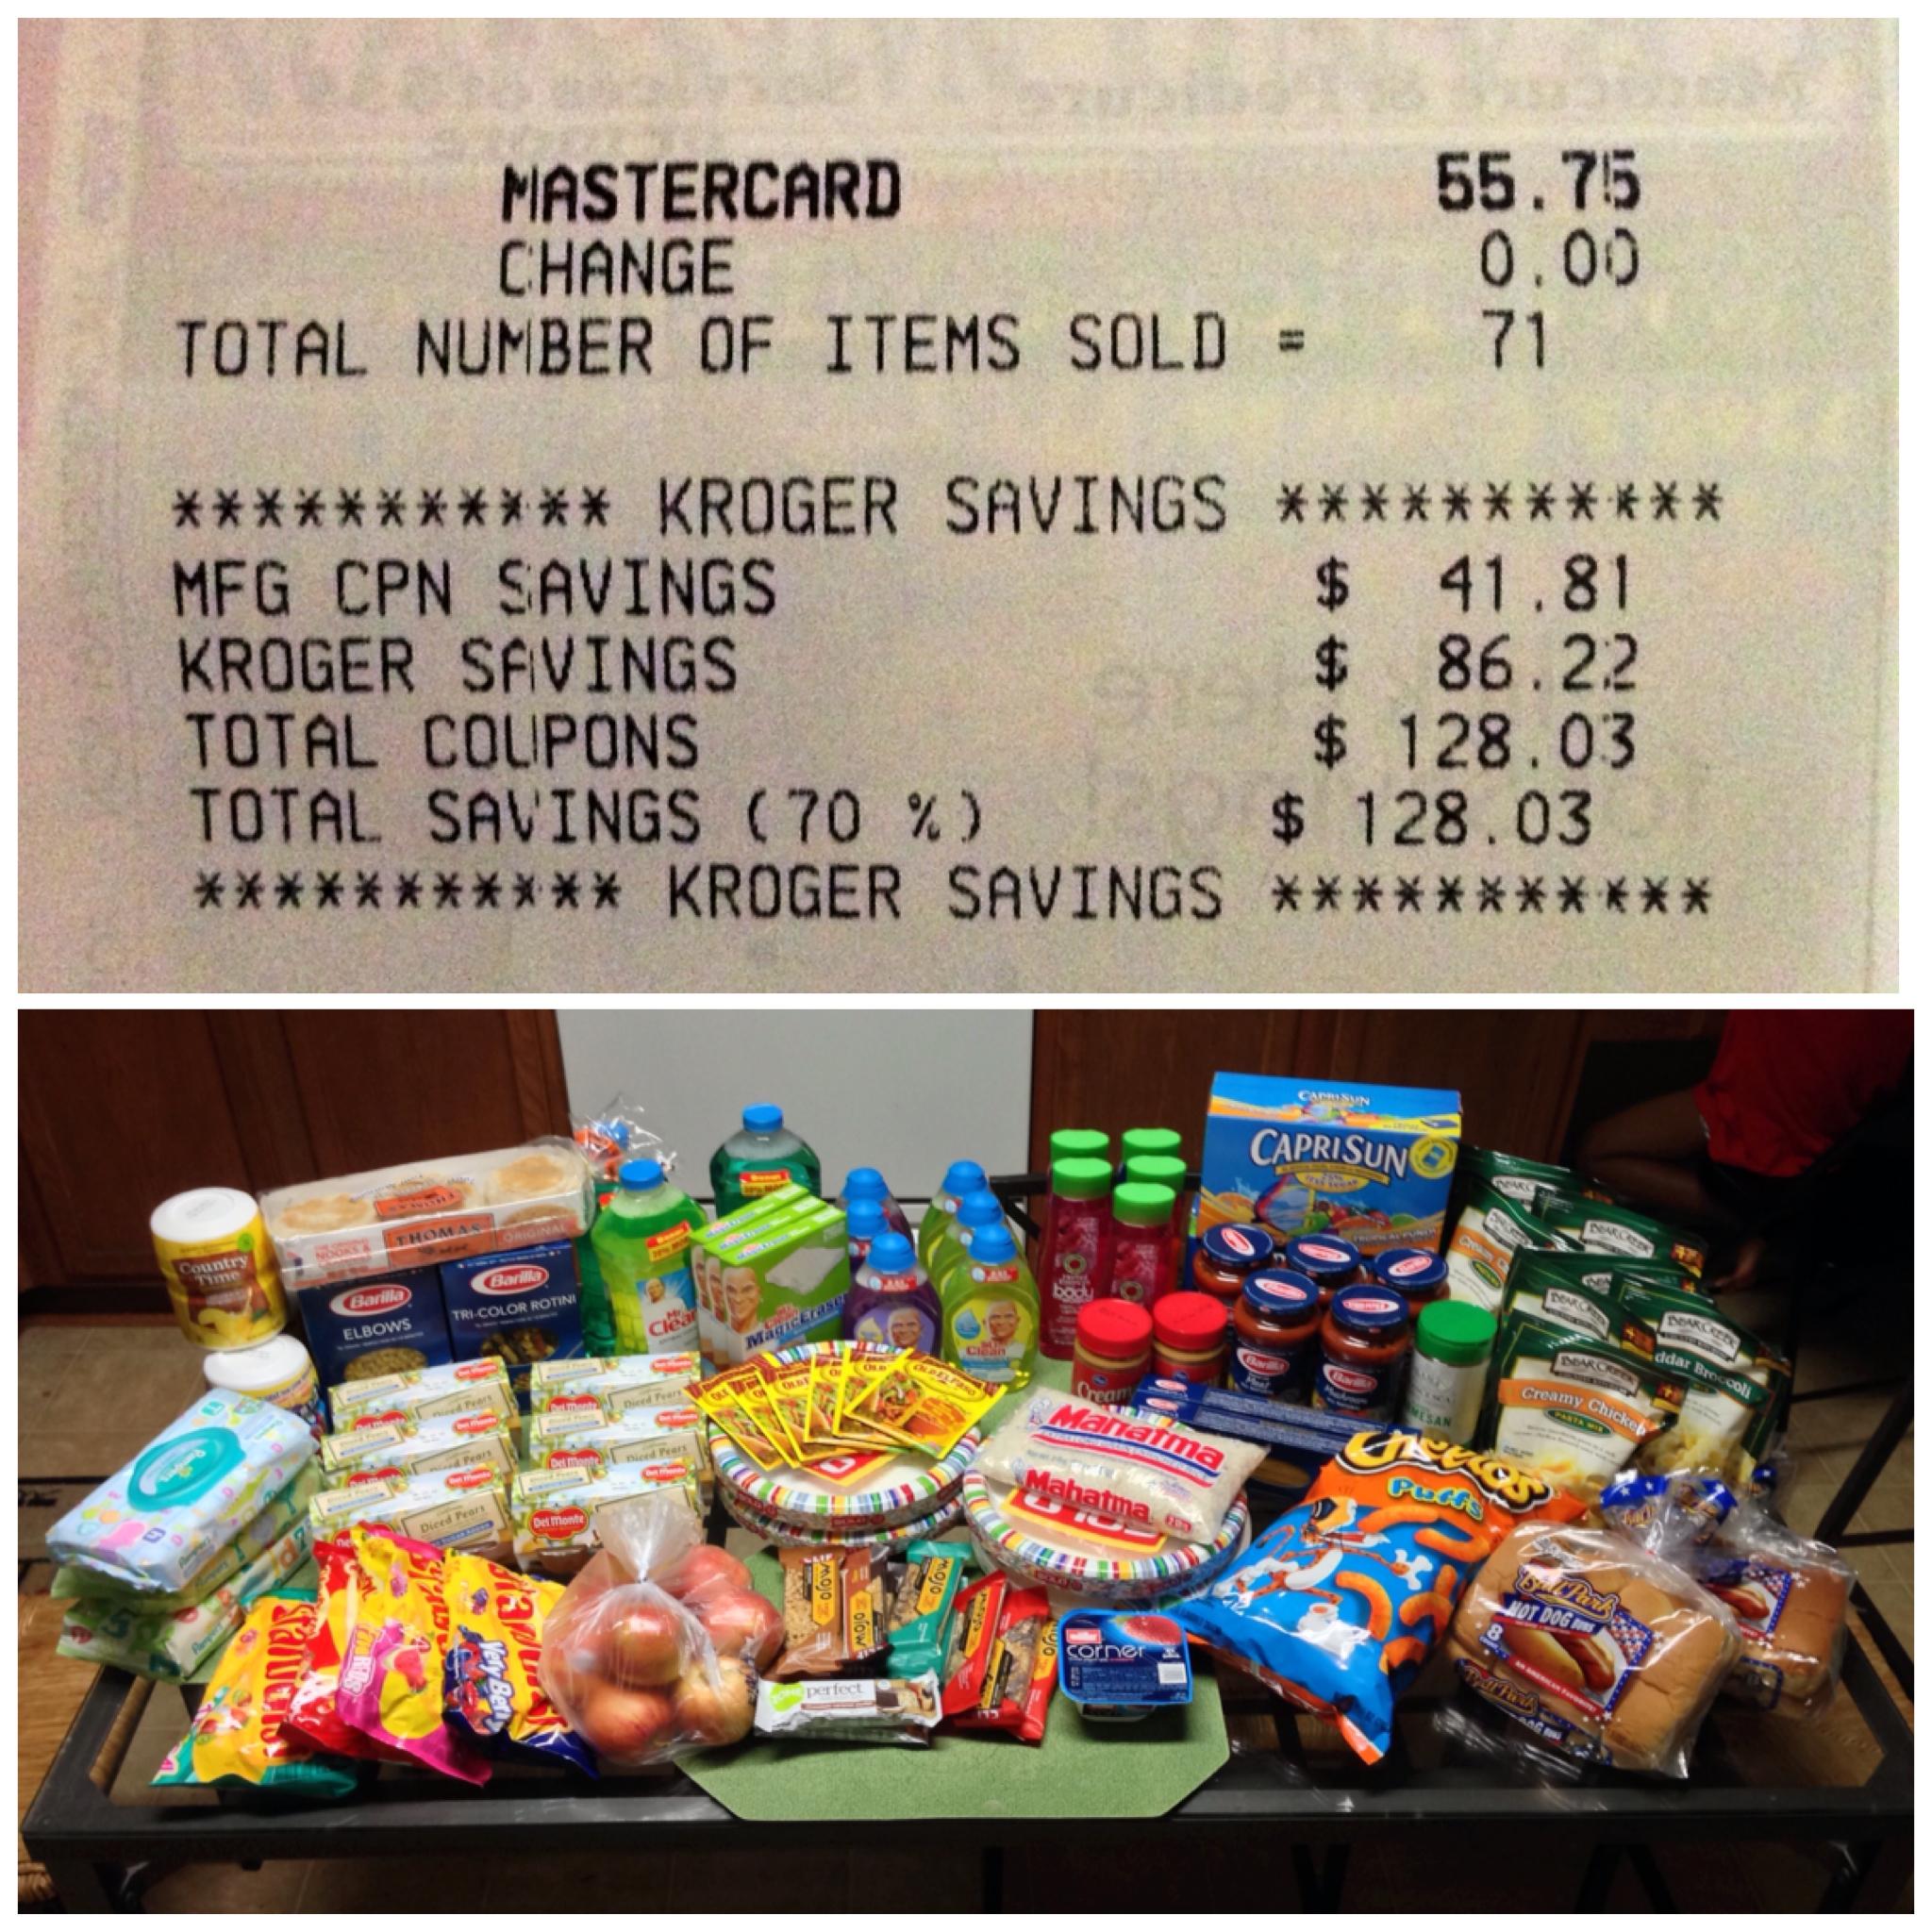 Csi coupon code